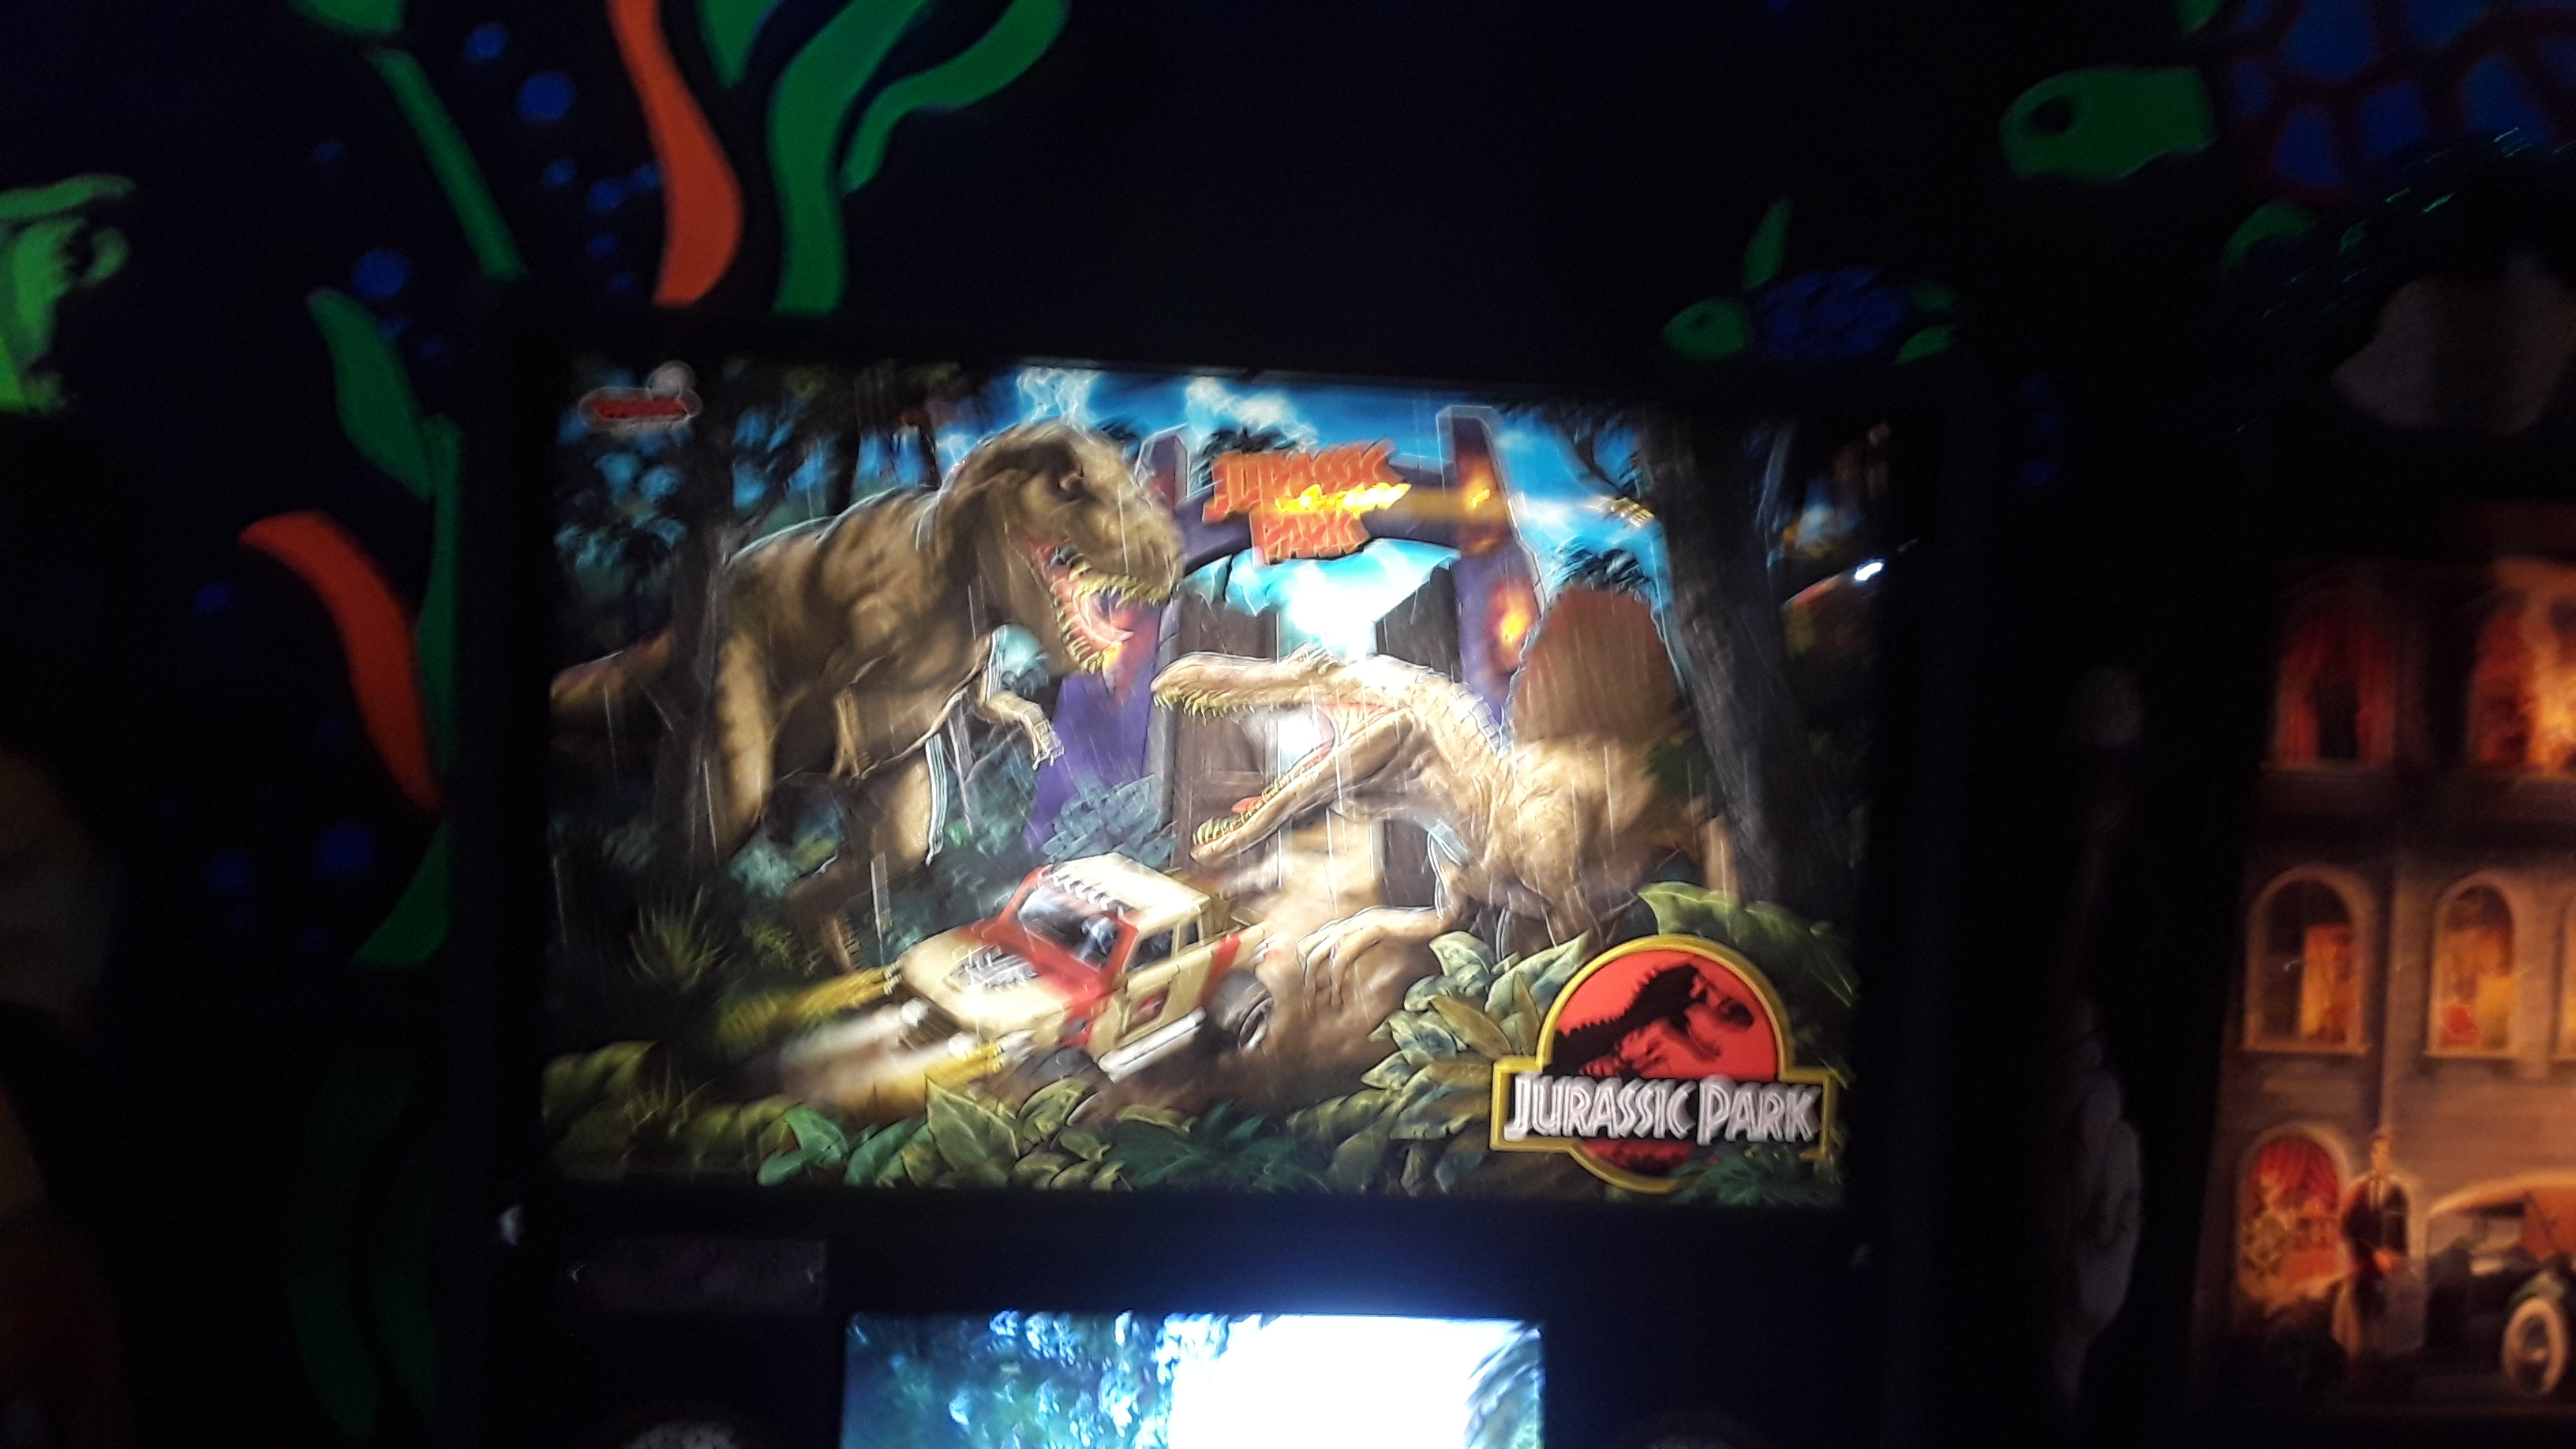 JML101582: Jurassic Park [2019 Stern] [LE] (Pinball: 3 Balls) 2,436,950 points on 2019-12-28 15:43:14